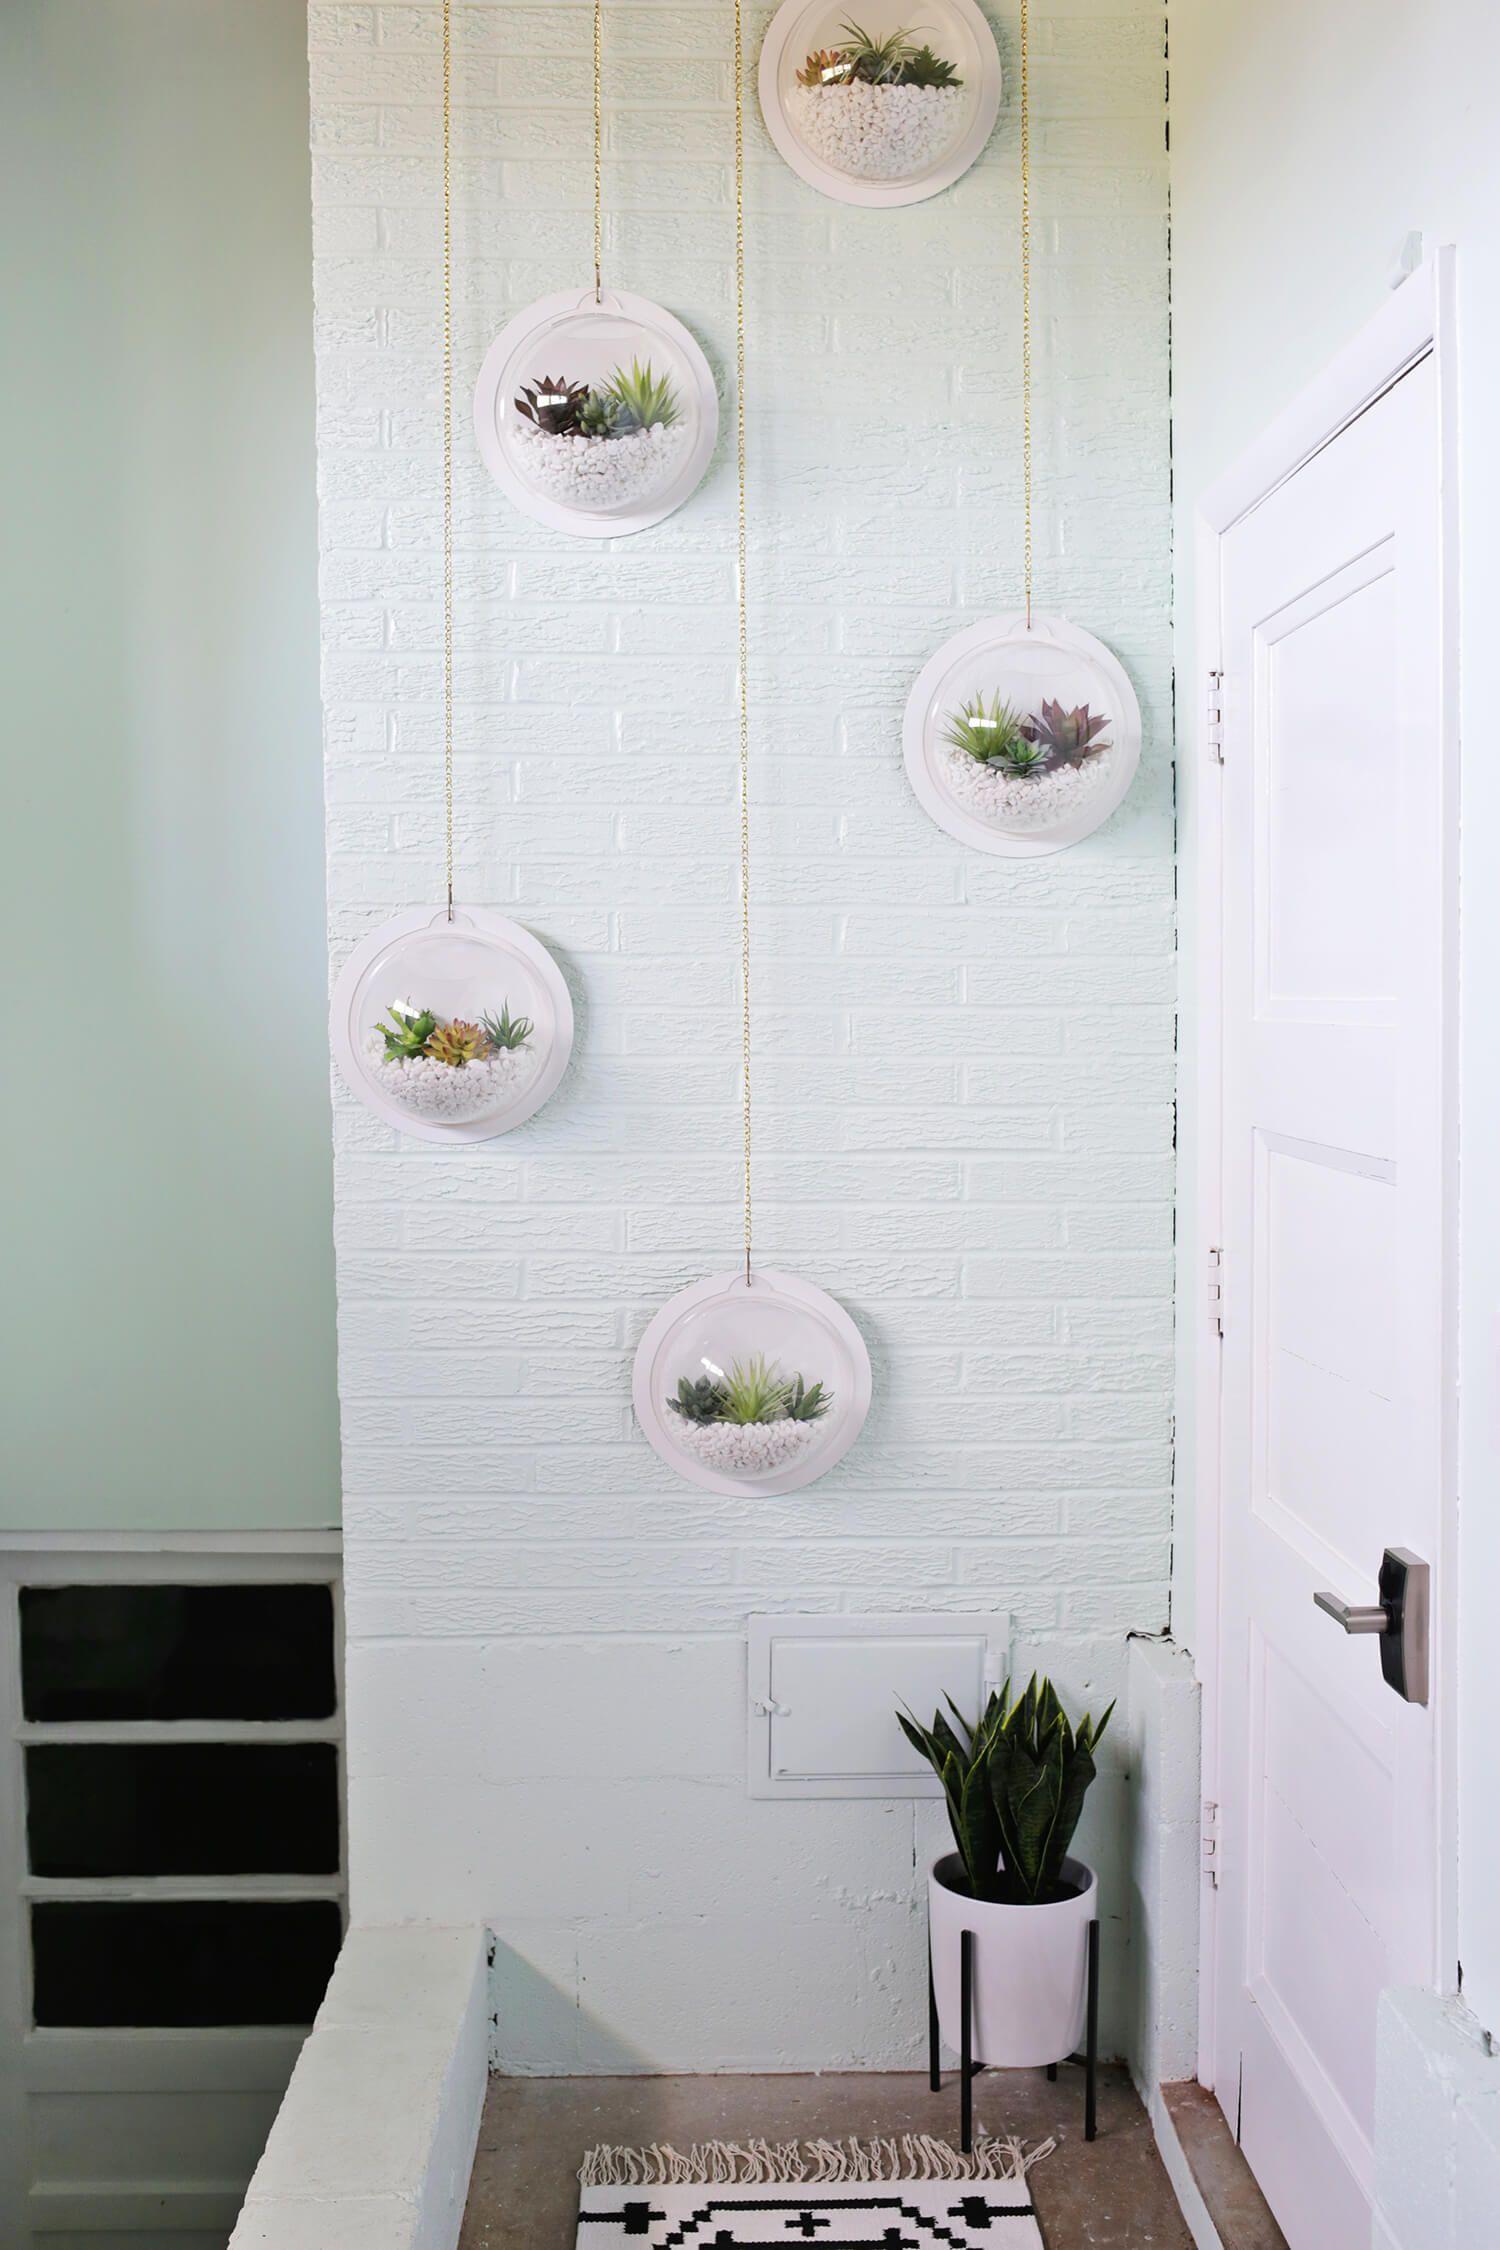 Hanging Terrarium Wall DIY | Hanging terrarium, Terraria and Walls